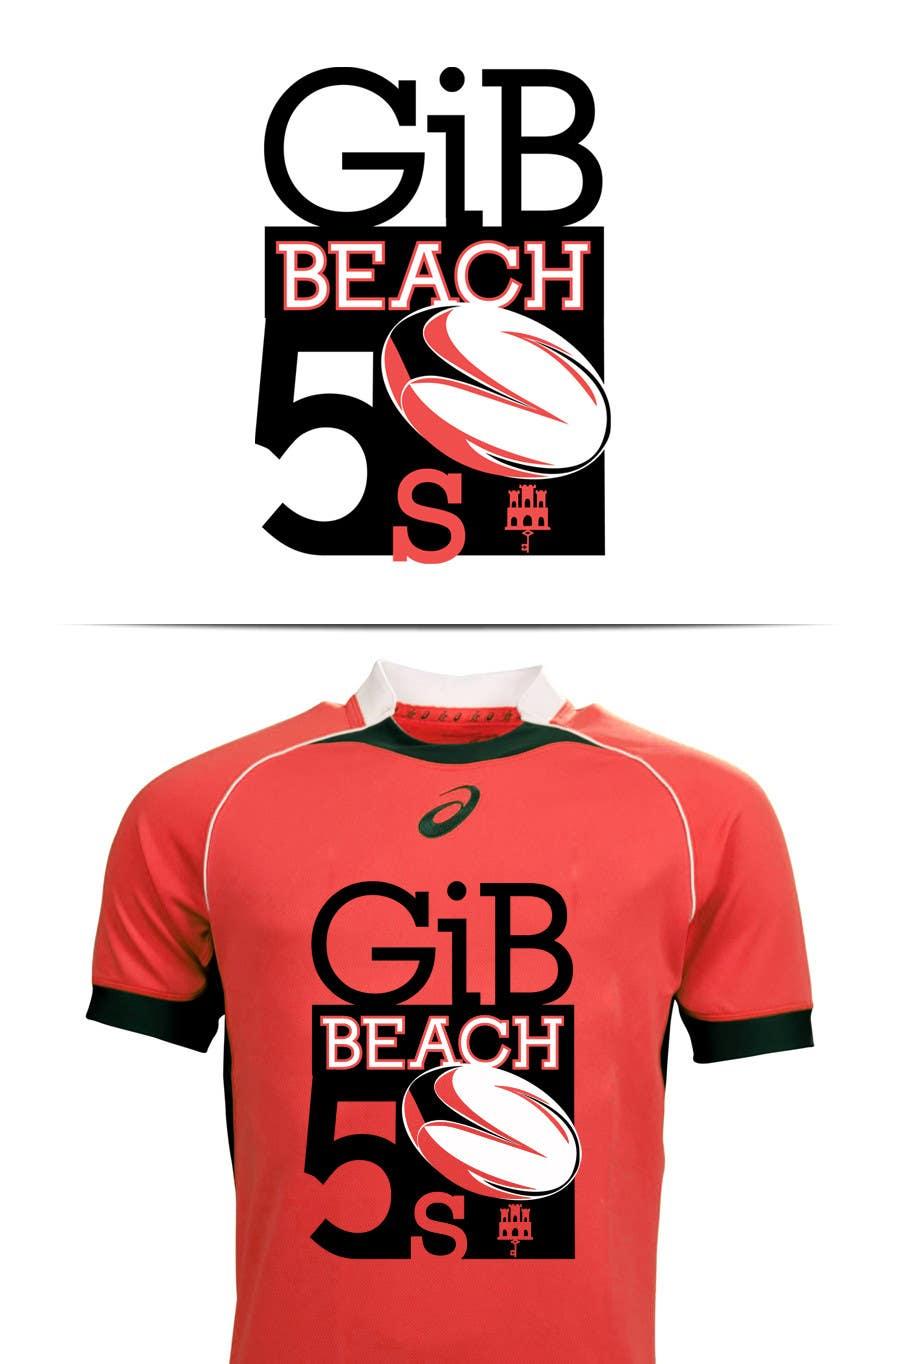 Kilpailutyö #21 kilpailussa Design a Logo for Beach Rugby - Use your imagination!